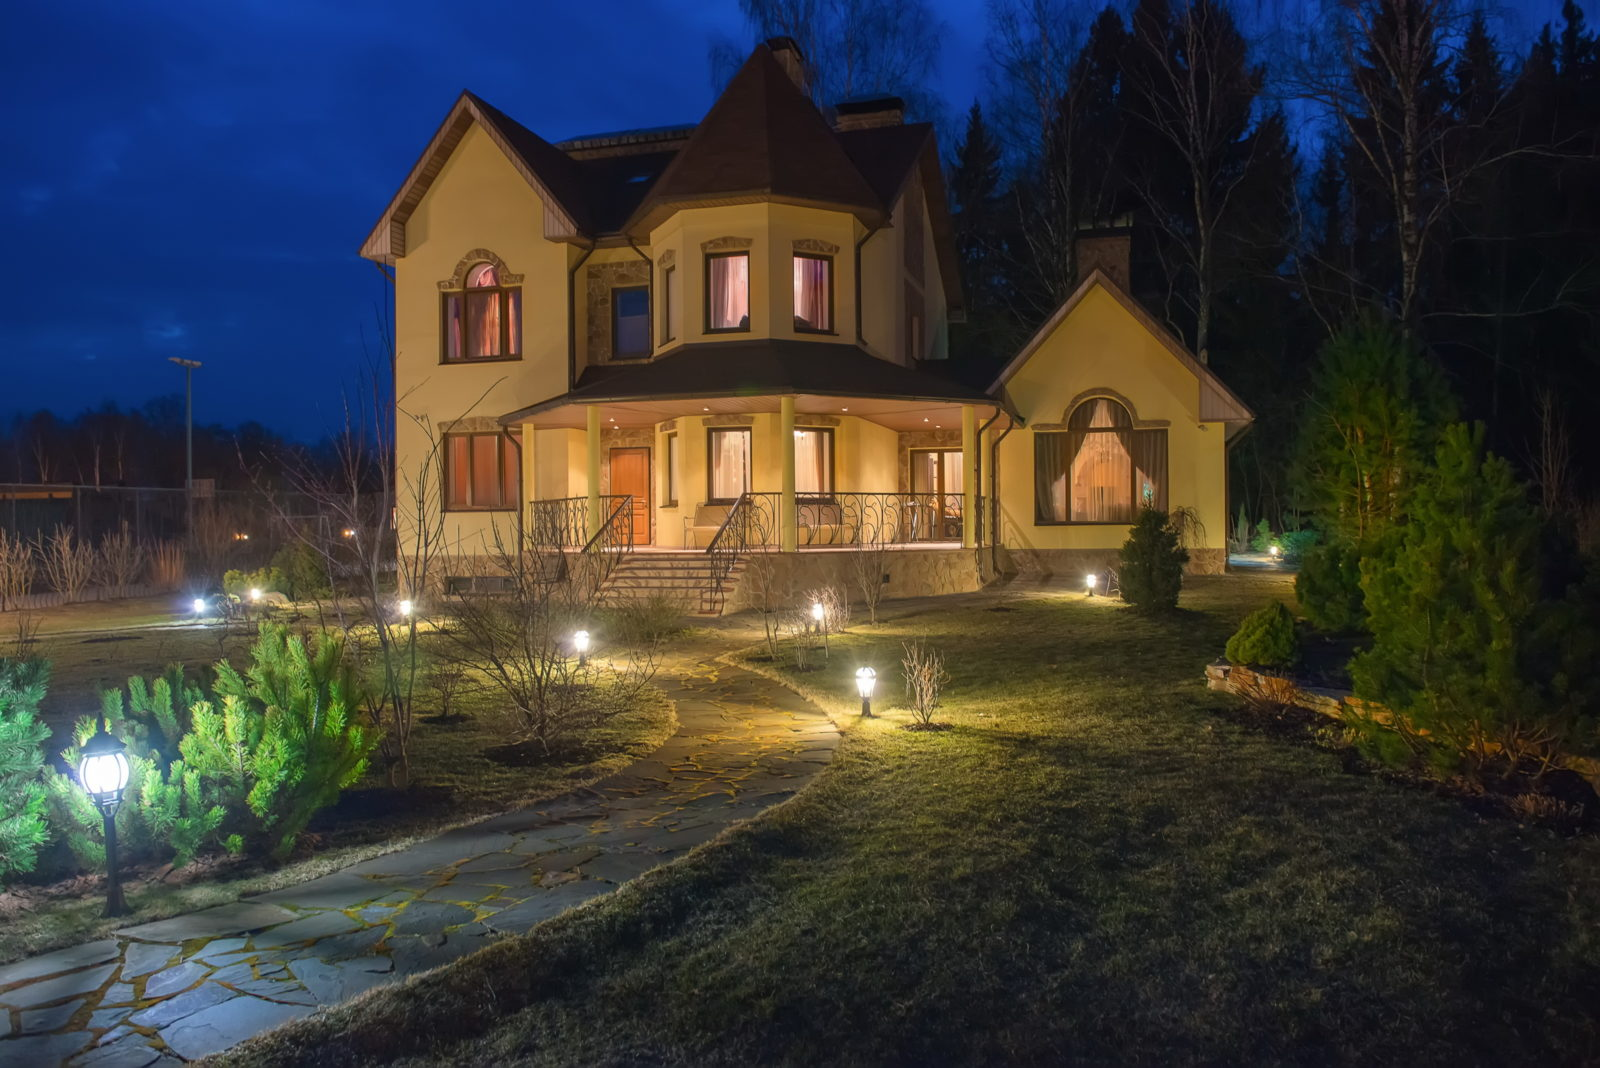 4 Key Benefits of Outdoor Lighting Installation